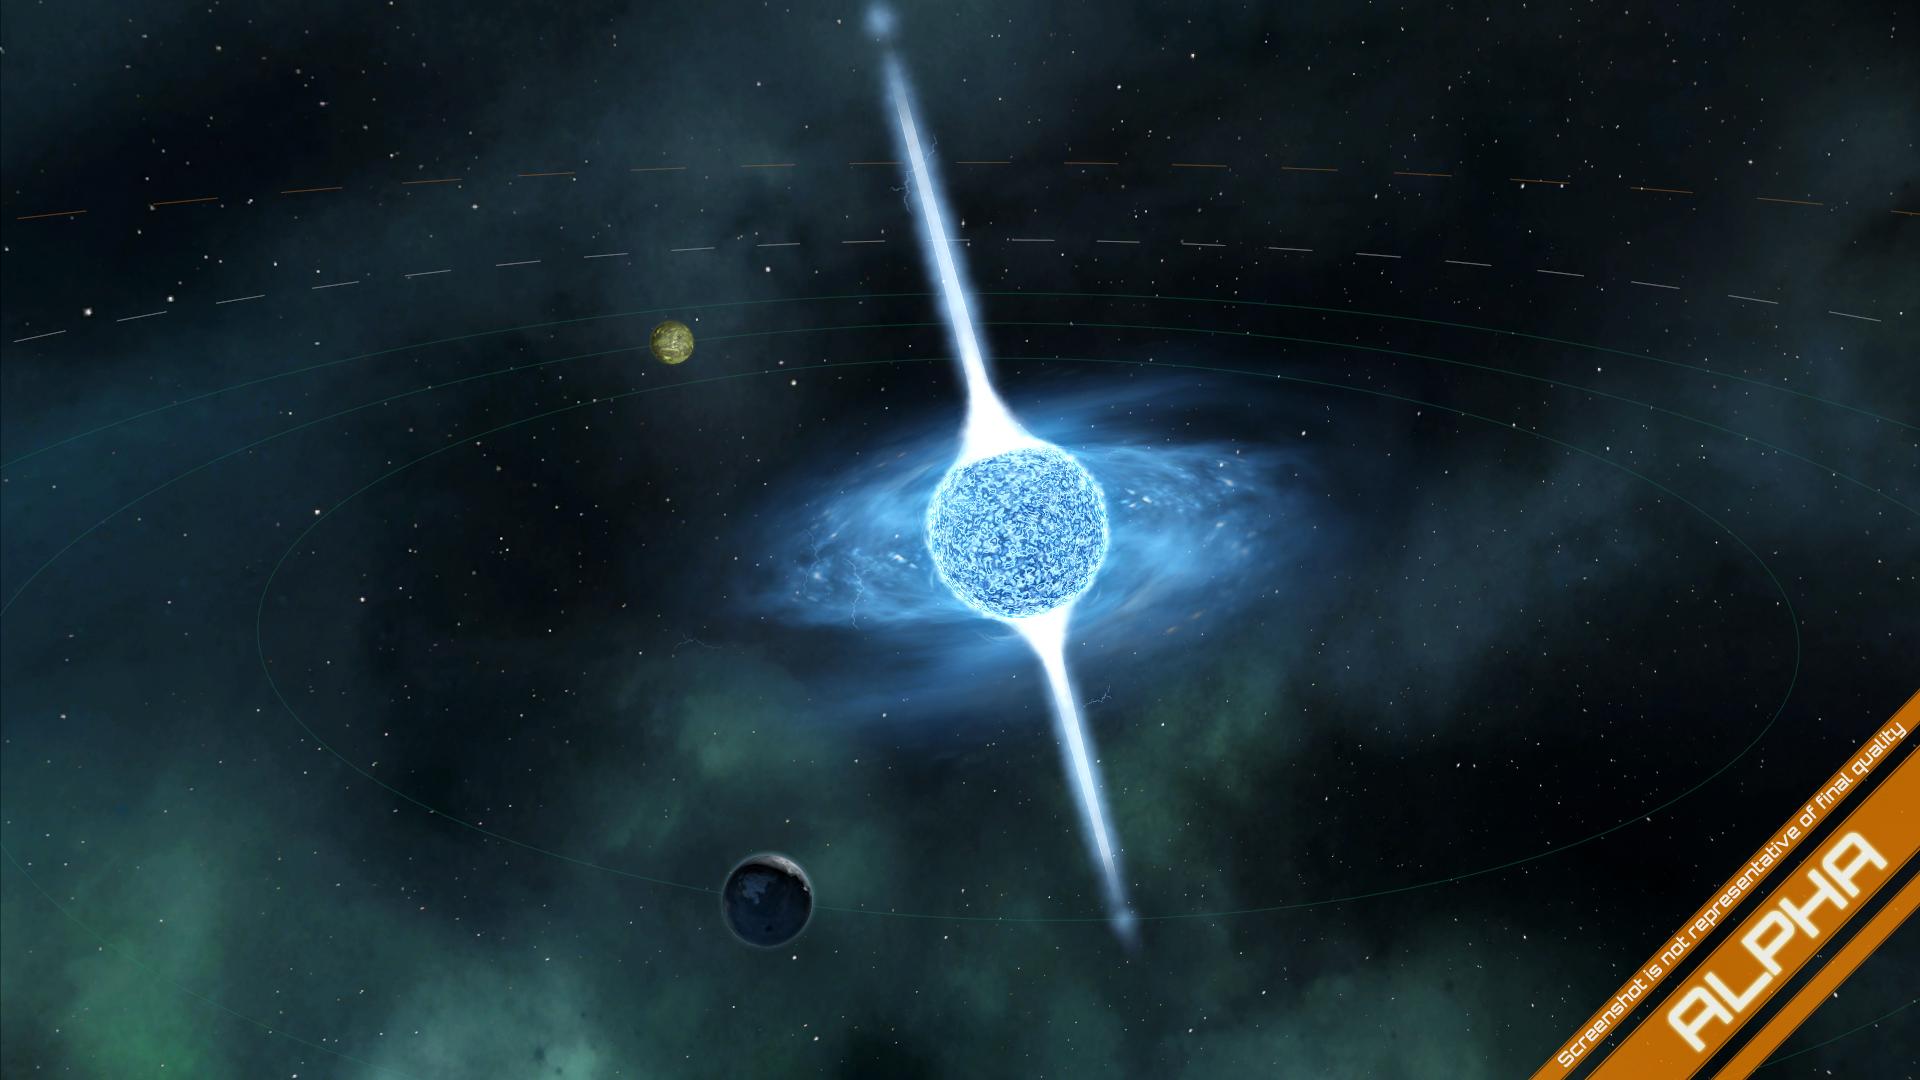 stellaris_dev_diary_03_02_20121005_pulsa